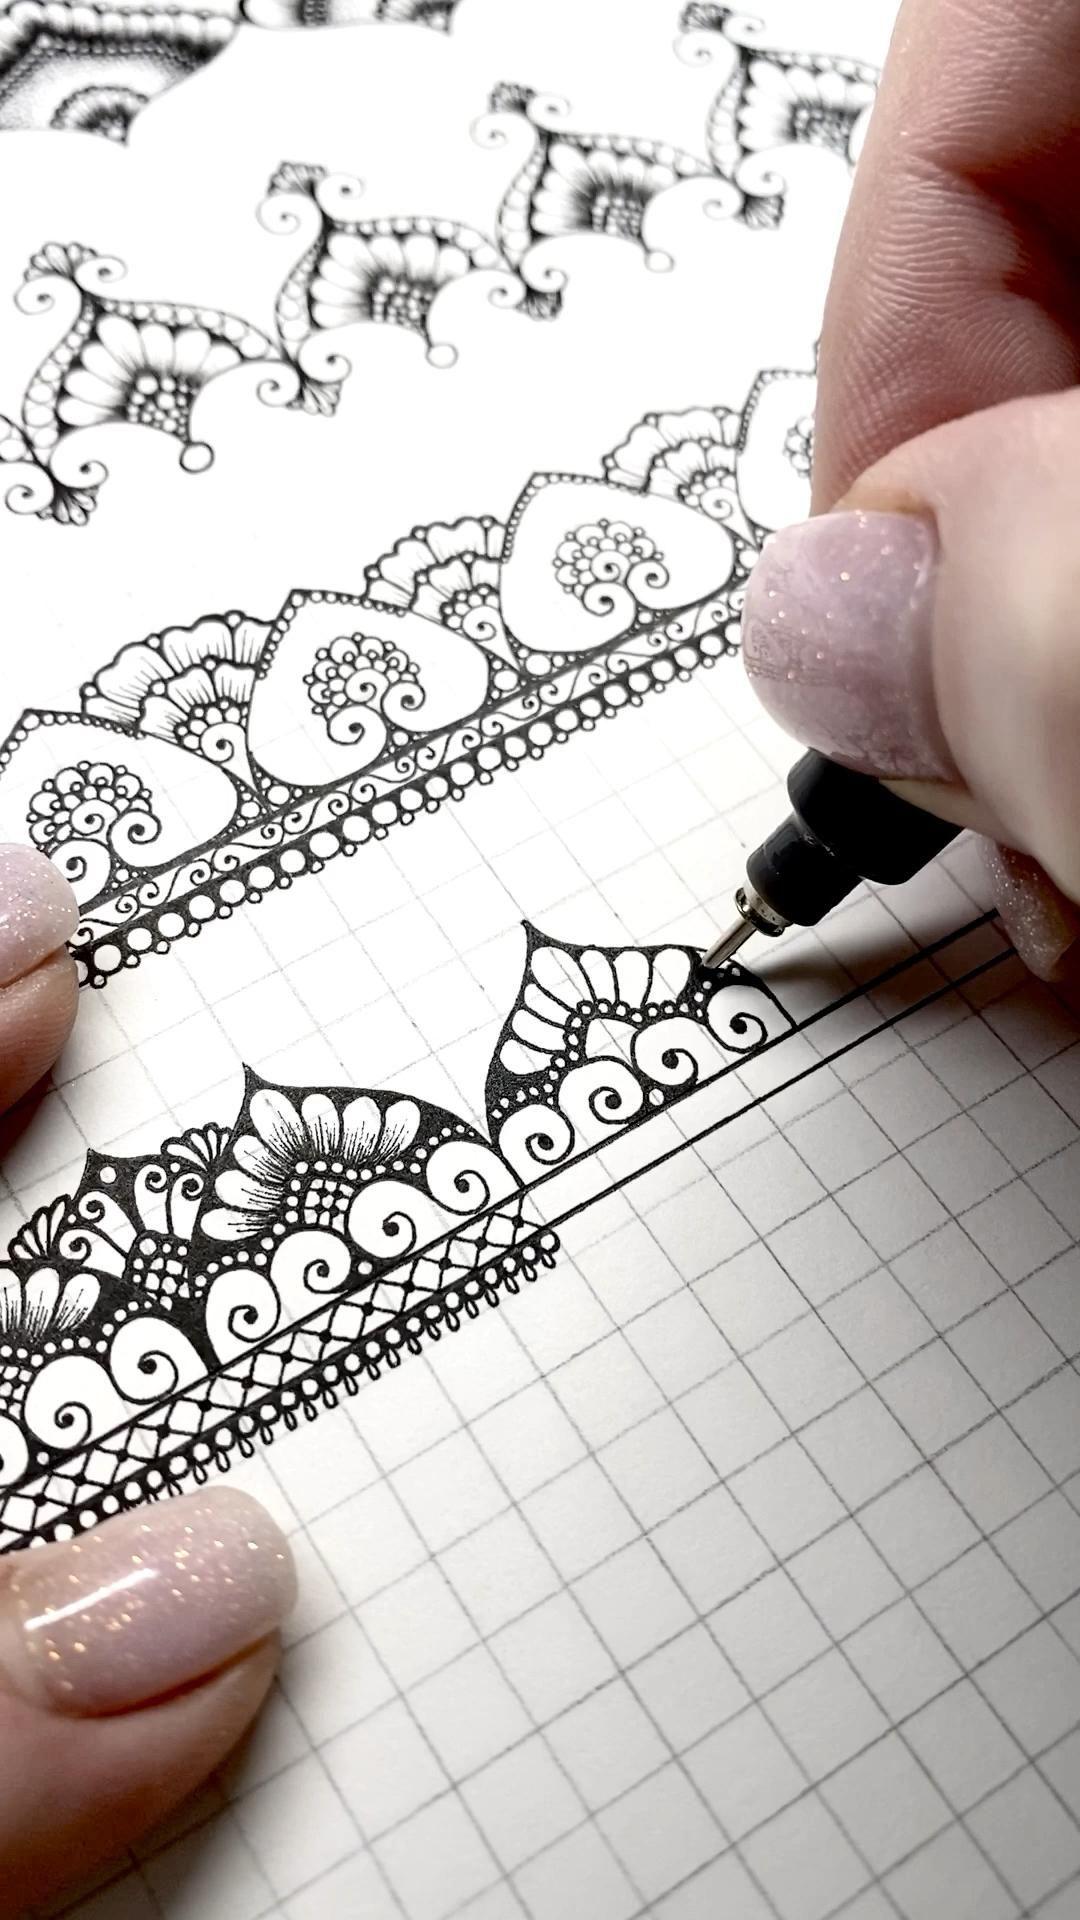 Senya Is Creating Mandala Art And Educating How To Draw Patreon Mandala Malen Anleitung Mandala Selber Malen Zeichnen Anleitung